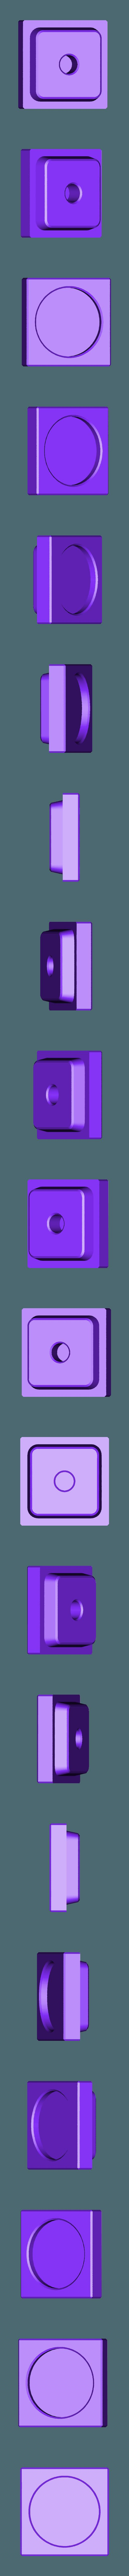 28mm_mini_case_dice_box.stl Download free STL file 28mm mini plinth remix; featuring name plates • Object to 3D print, daftpirate15